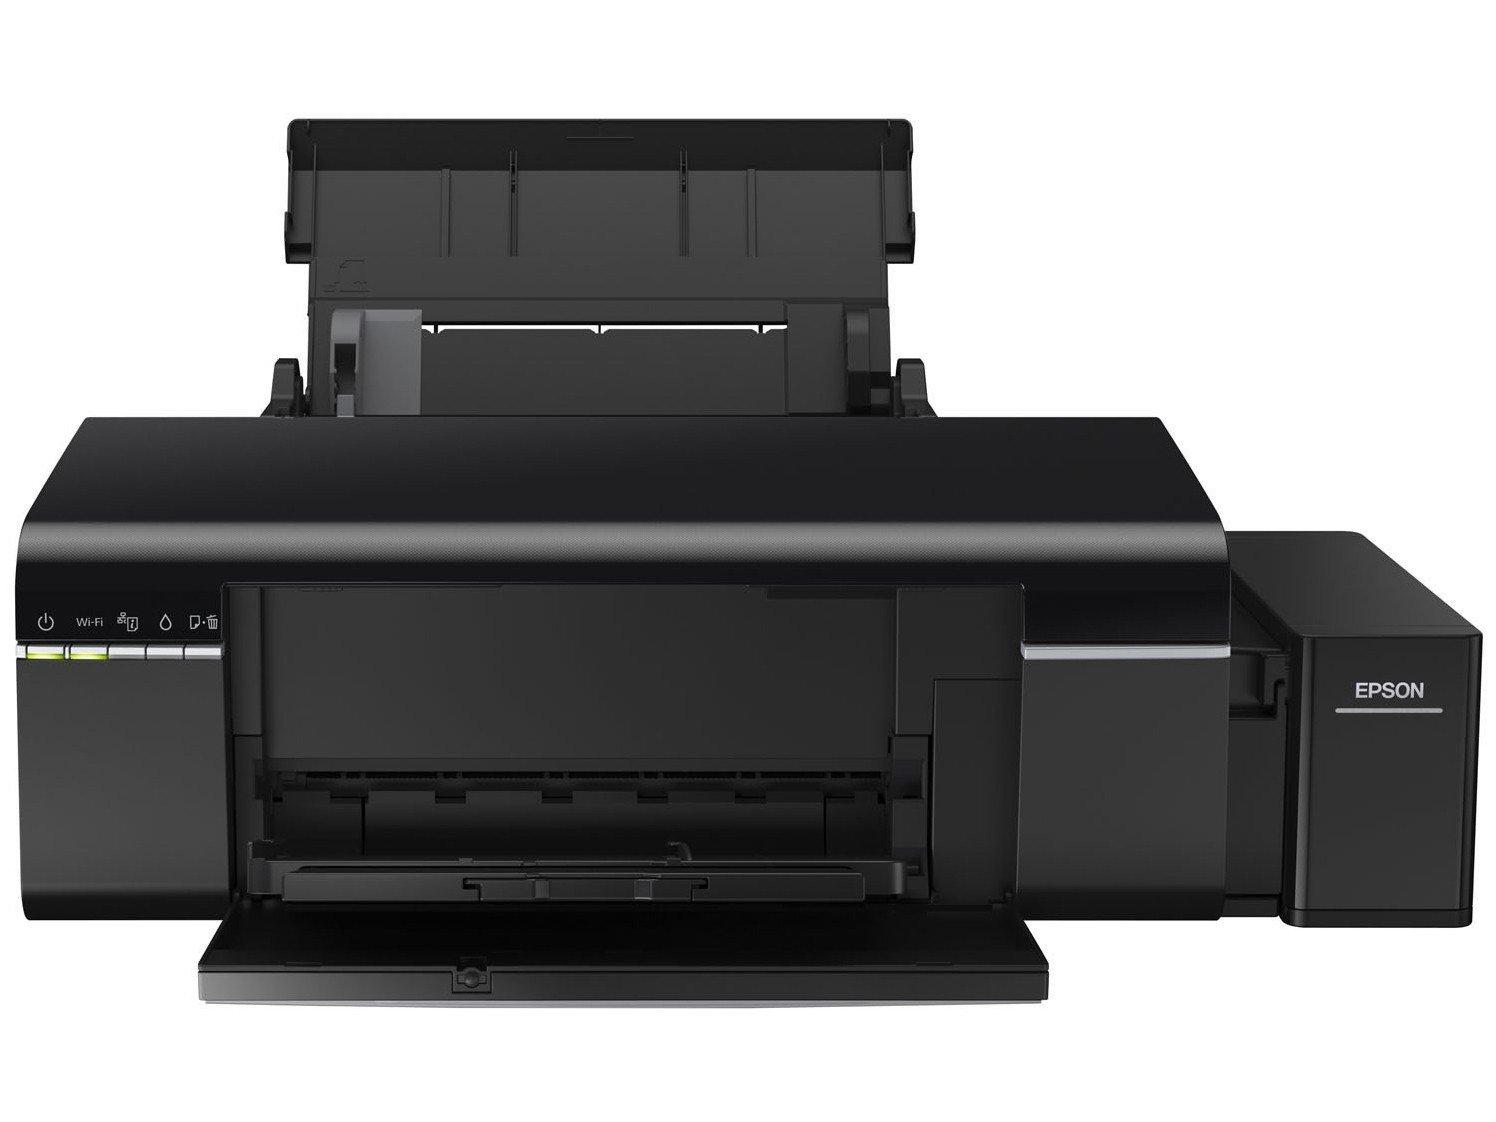 Foto 5 - Impressora Epson EcoTank L805 Jato de Tinta - Colorida Wireless USB